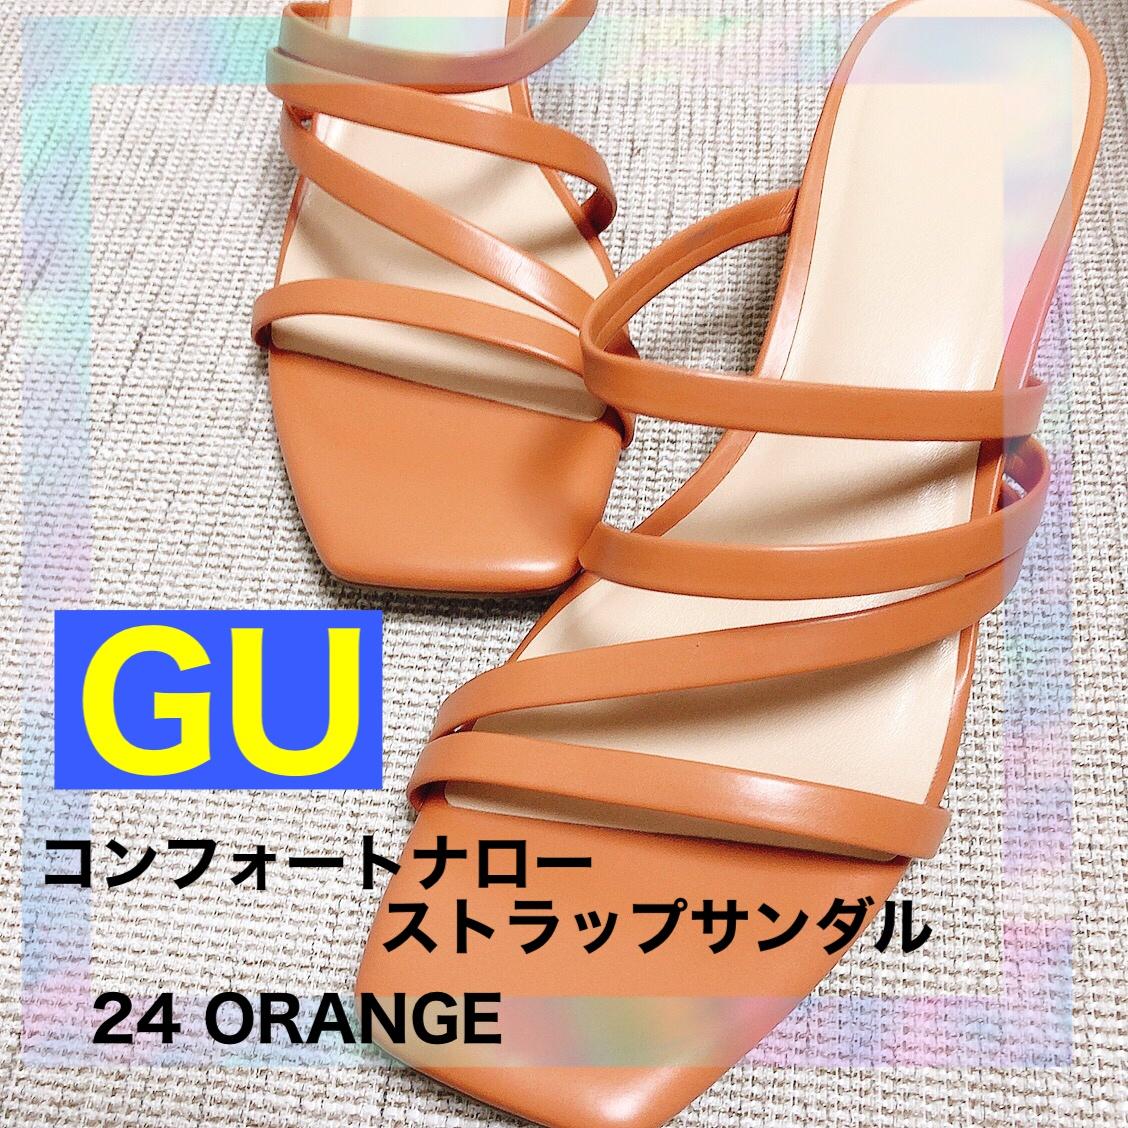 GU(ジーユー) コンフォートナローストラップサンダルの良い点・メリットに関するkhさんの口コミ画像1